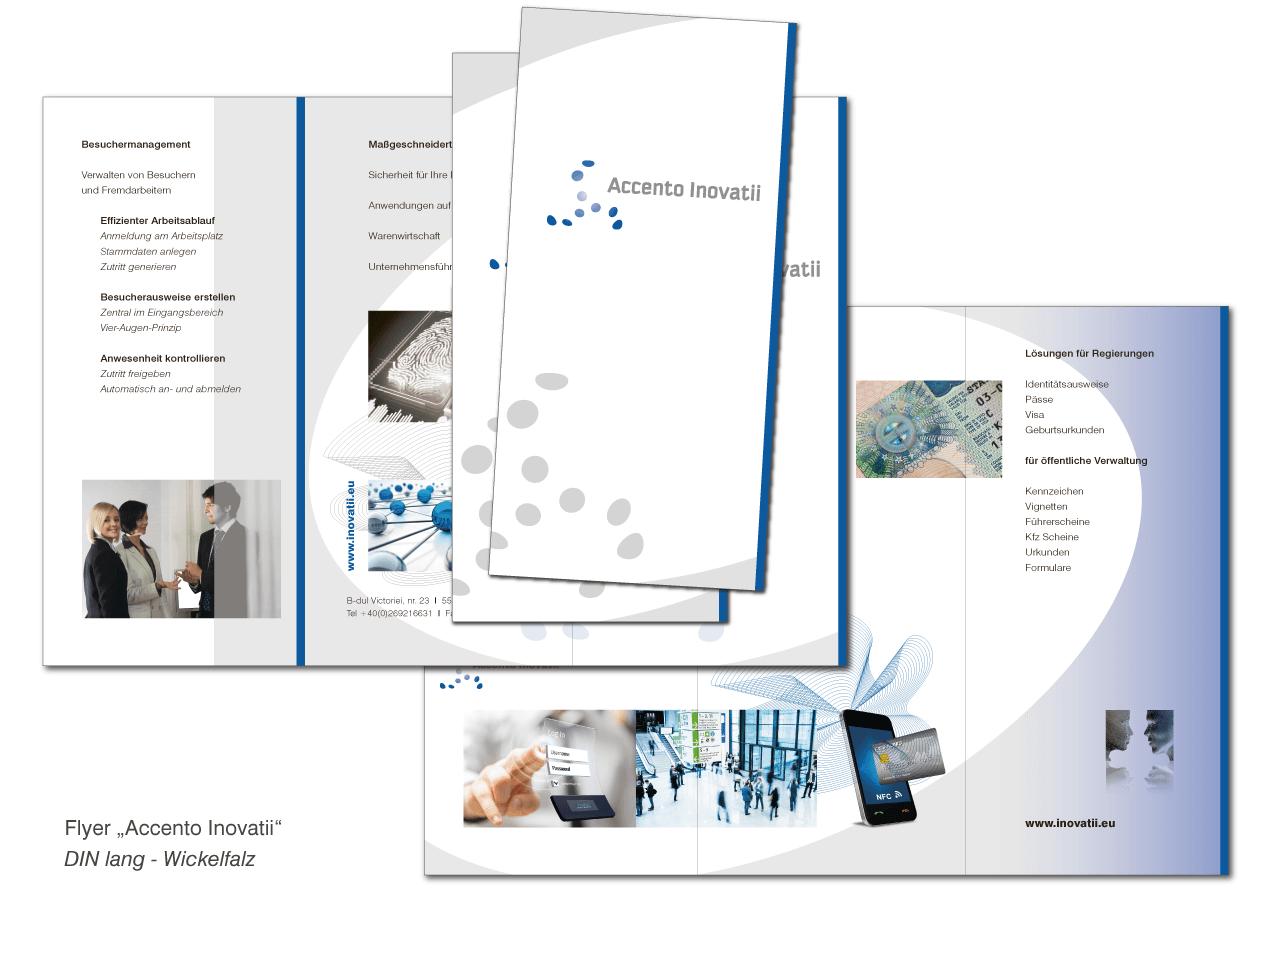 Accento Inovatii - Flyer DIN lang (Wickelfalz)